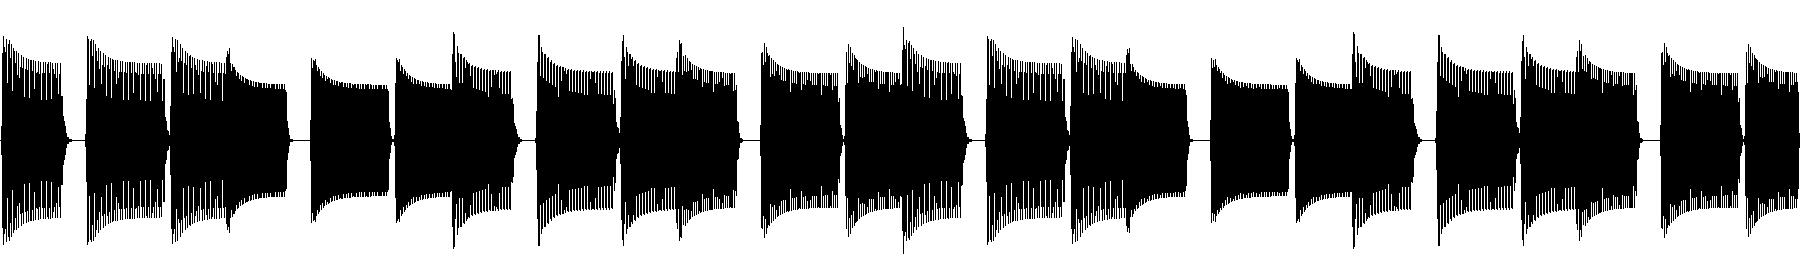 vedh melodyloop 102 f c dm b 120bpm